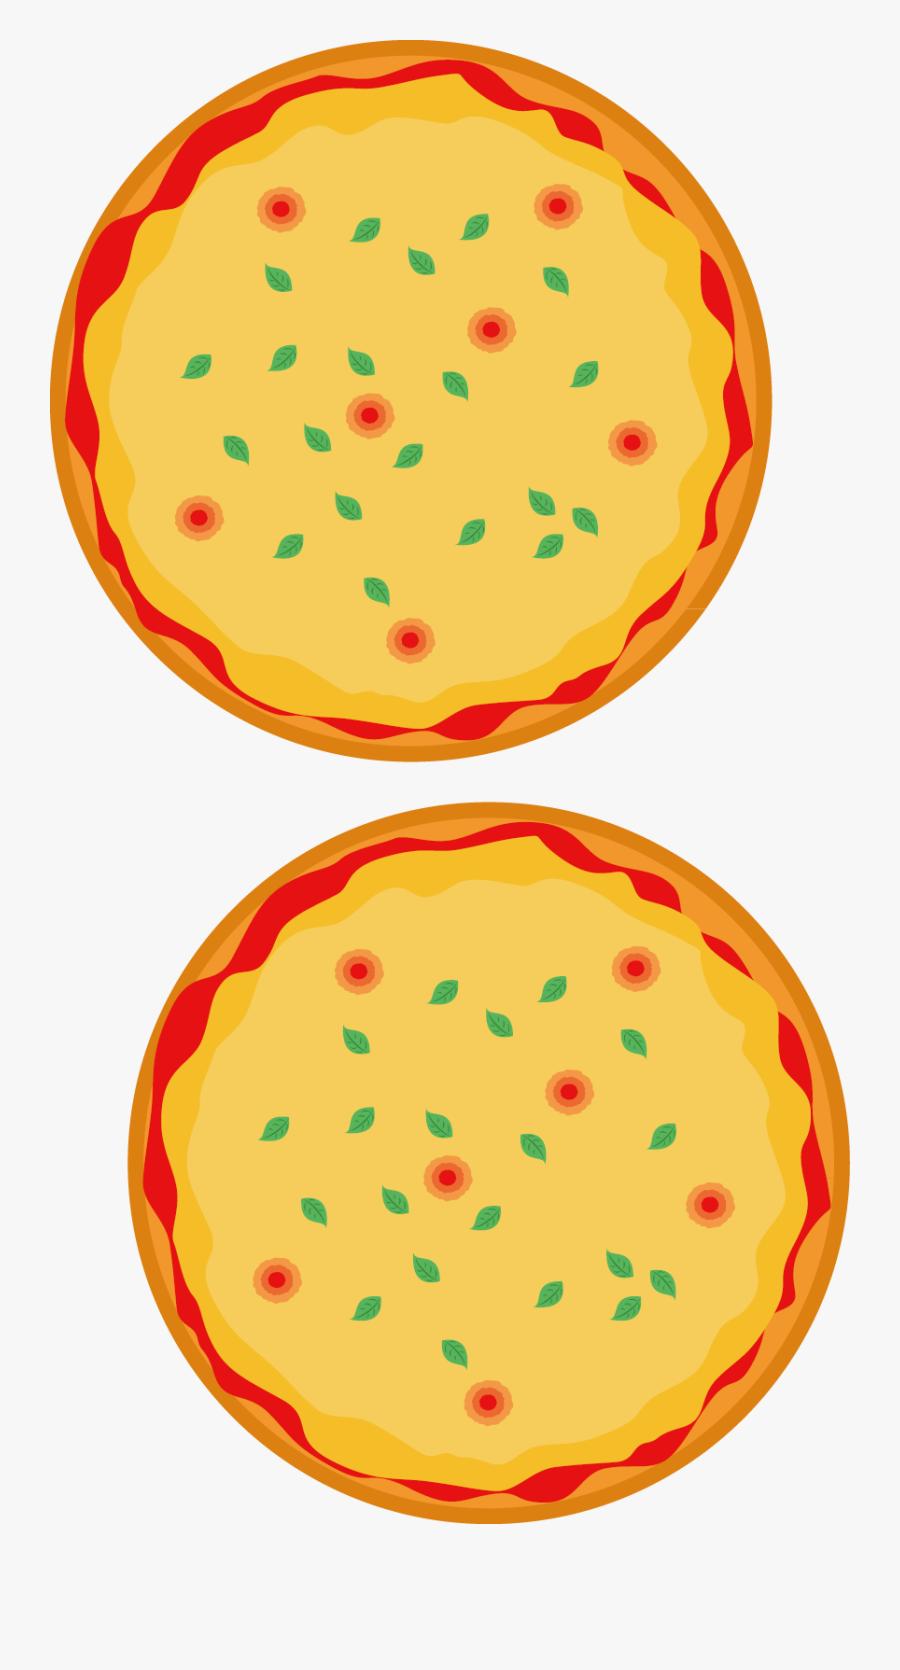 Pizza Italian Cuisine Fast Food Clip Art - Pizza Icon Png, Transparent Clipart